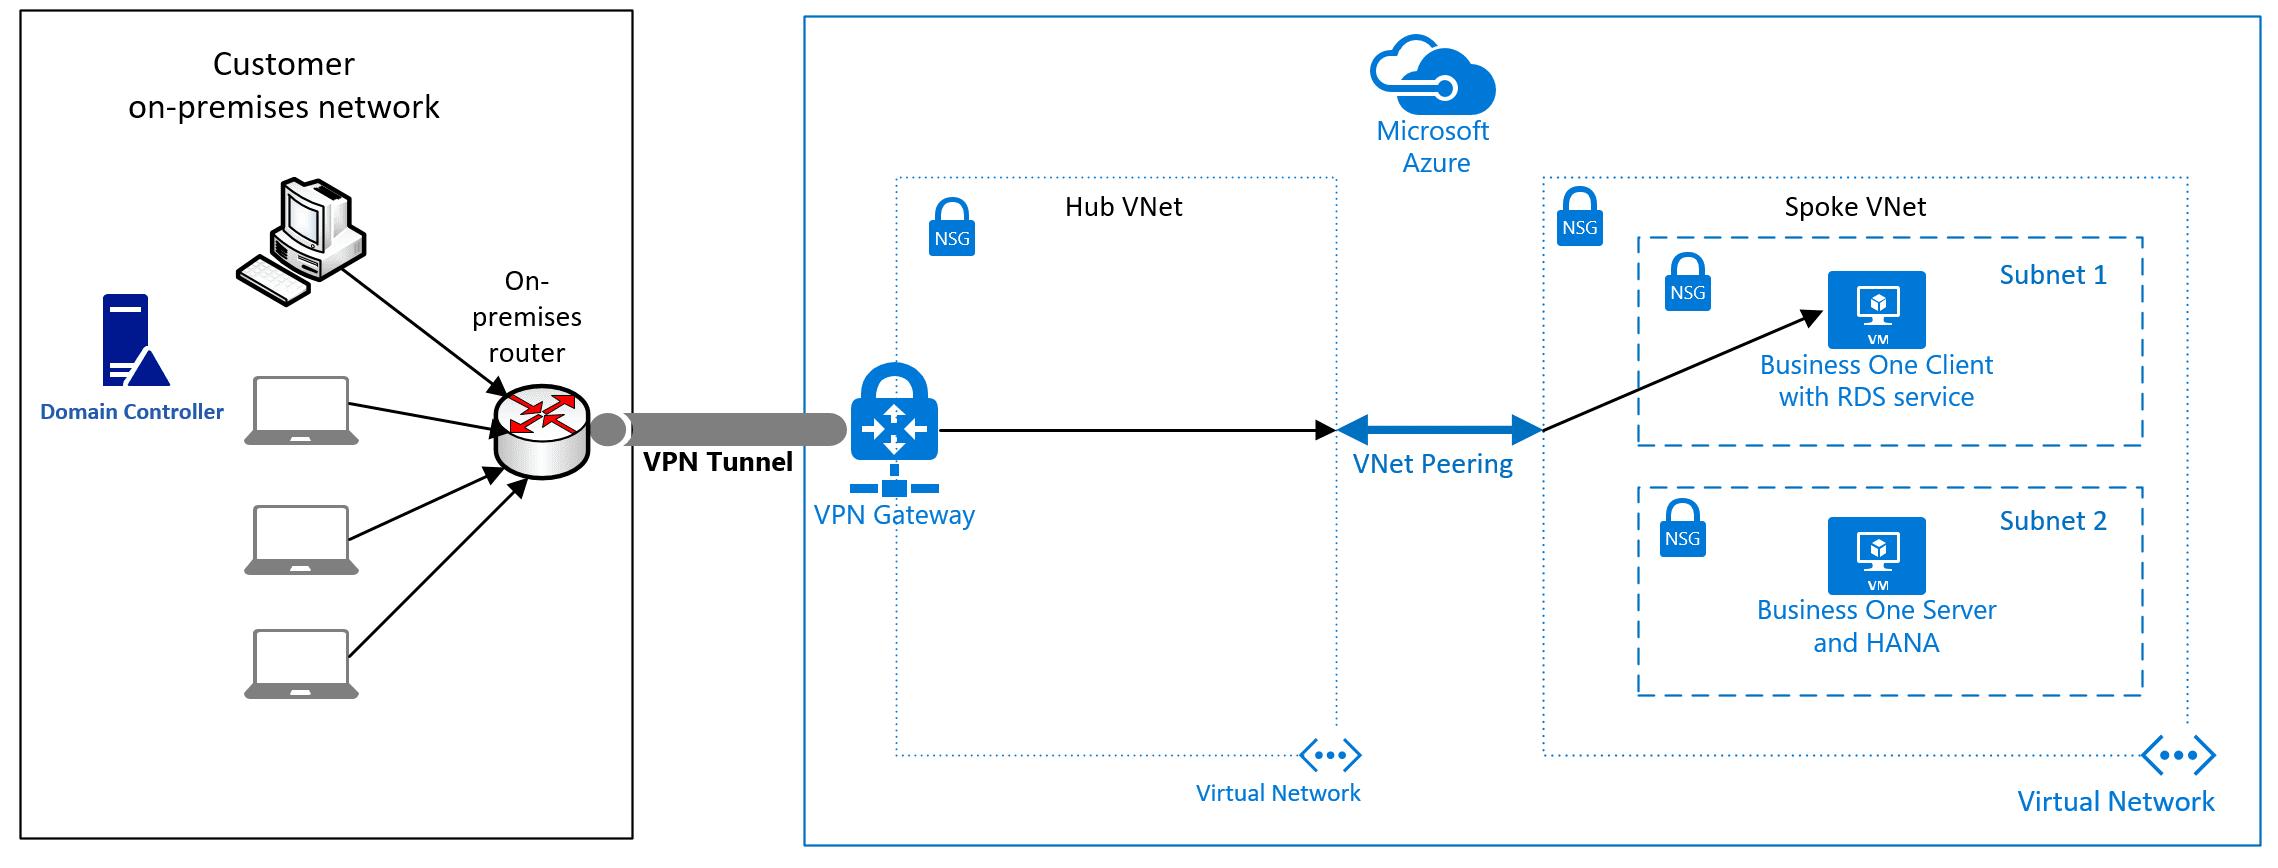 VPN%20Tunnel%20for%20SAP%20Business%20One%20Azure%201